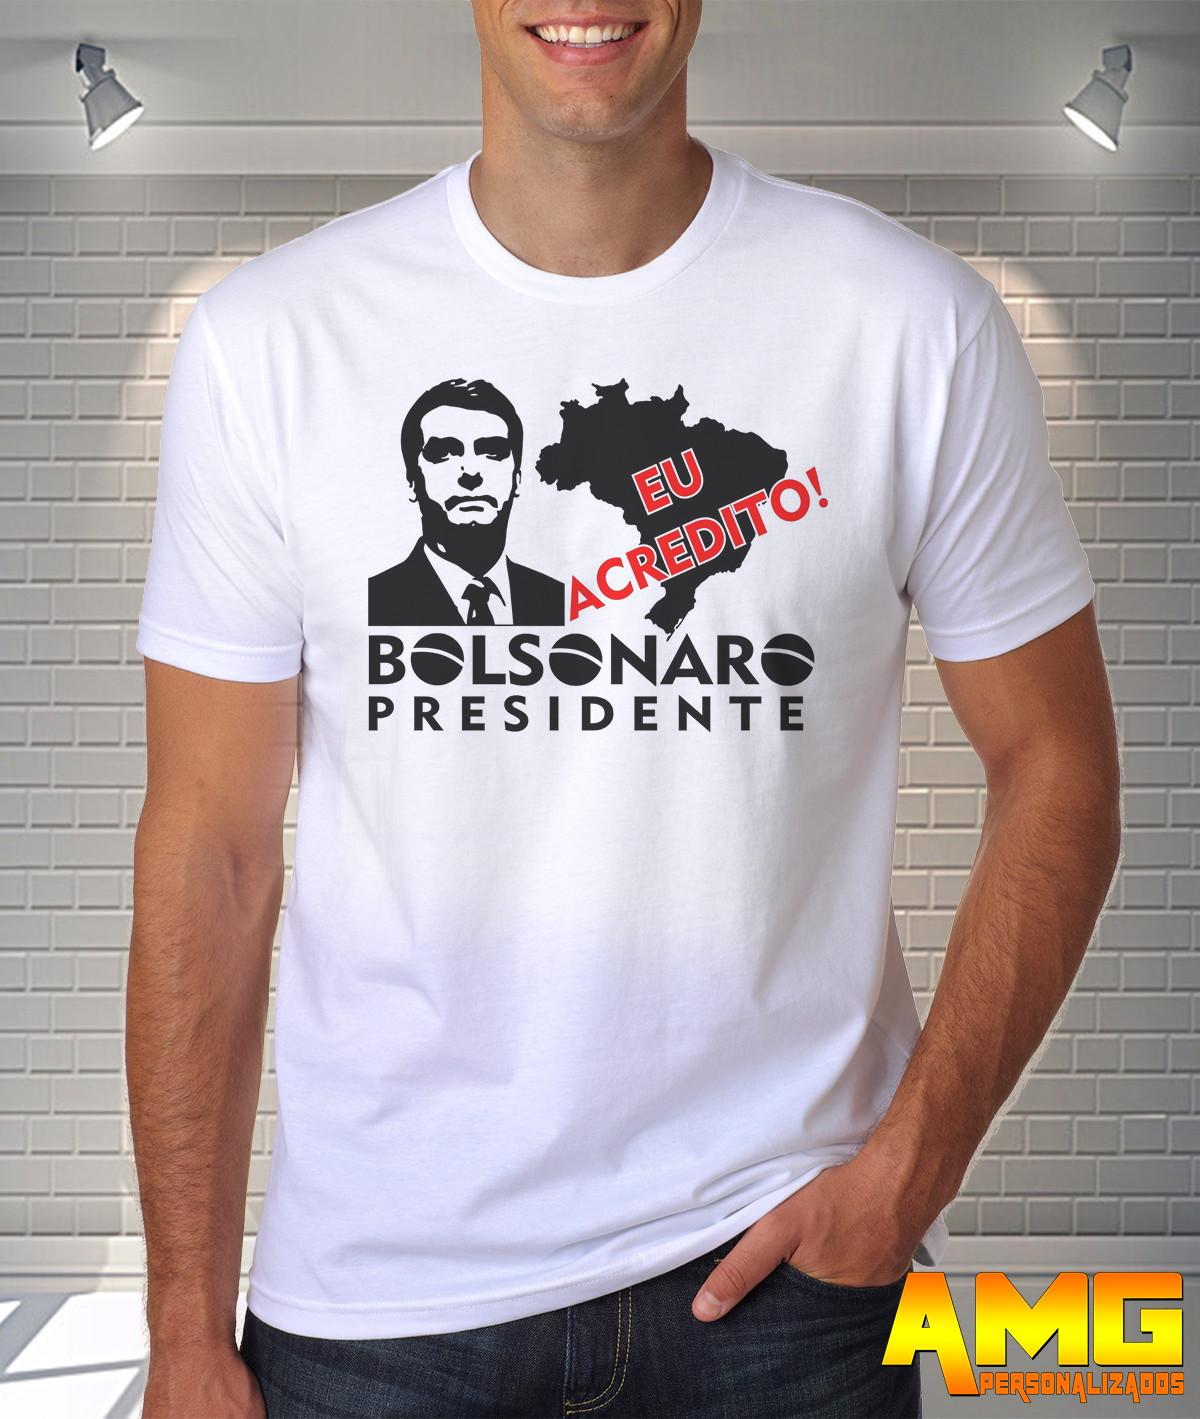 Camisa Camiseta Bolsonaro Presidente 2018  565502c891e